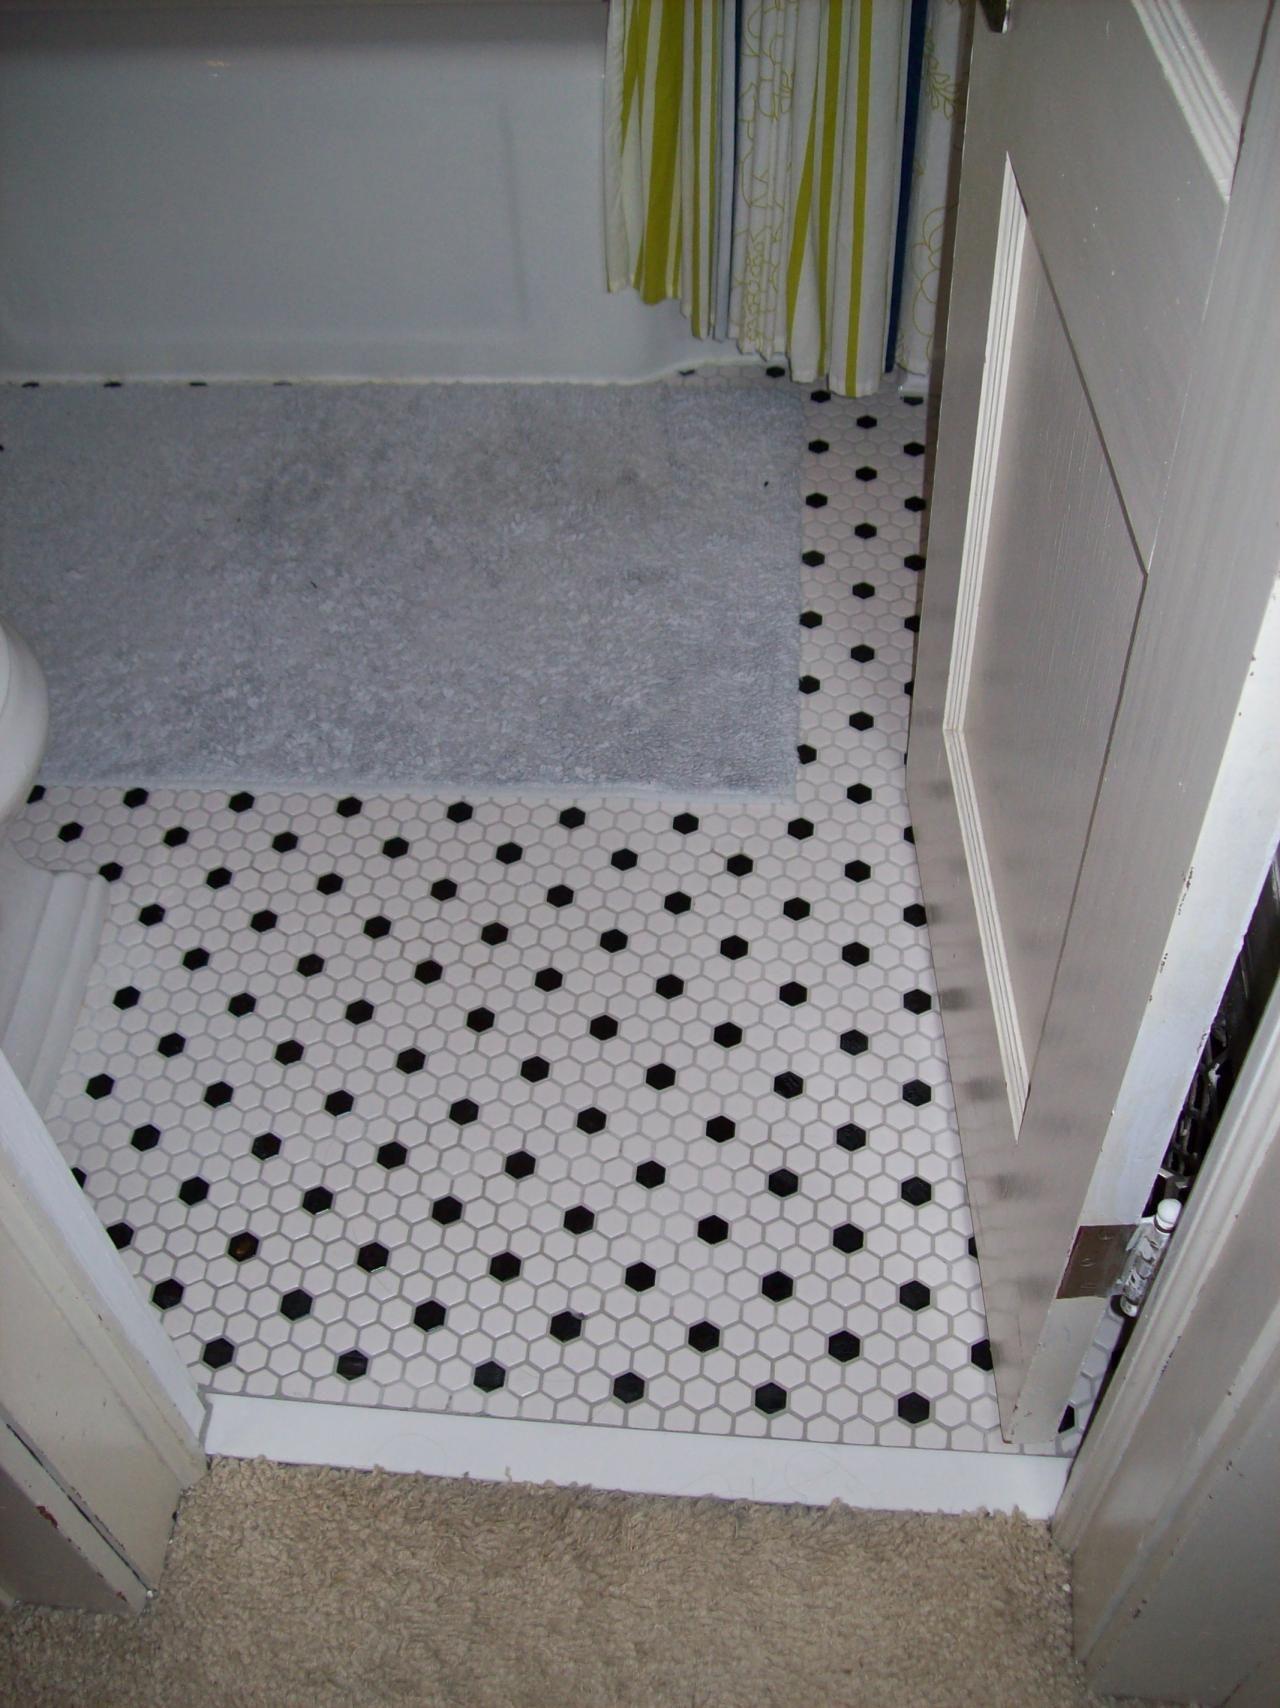 17 best images about bathroom on pinterest greige paint colors alcove and tile - Bathroom Floor Tile